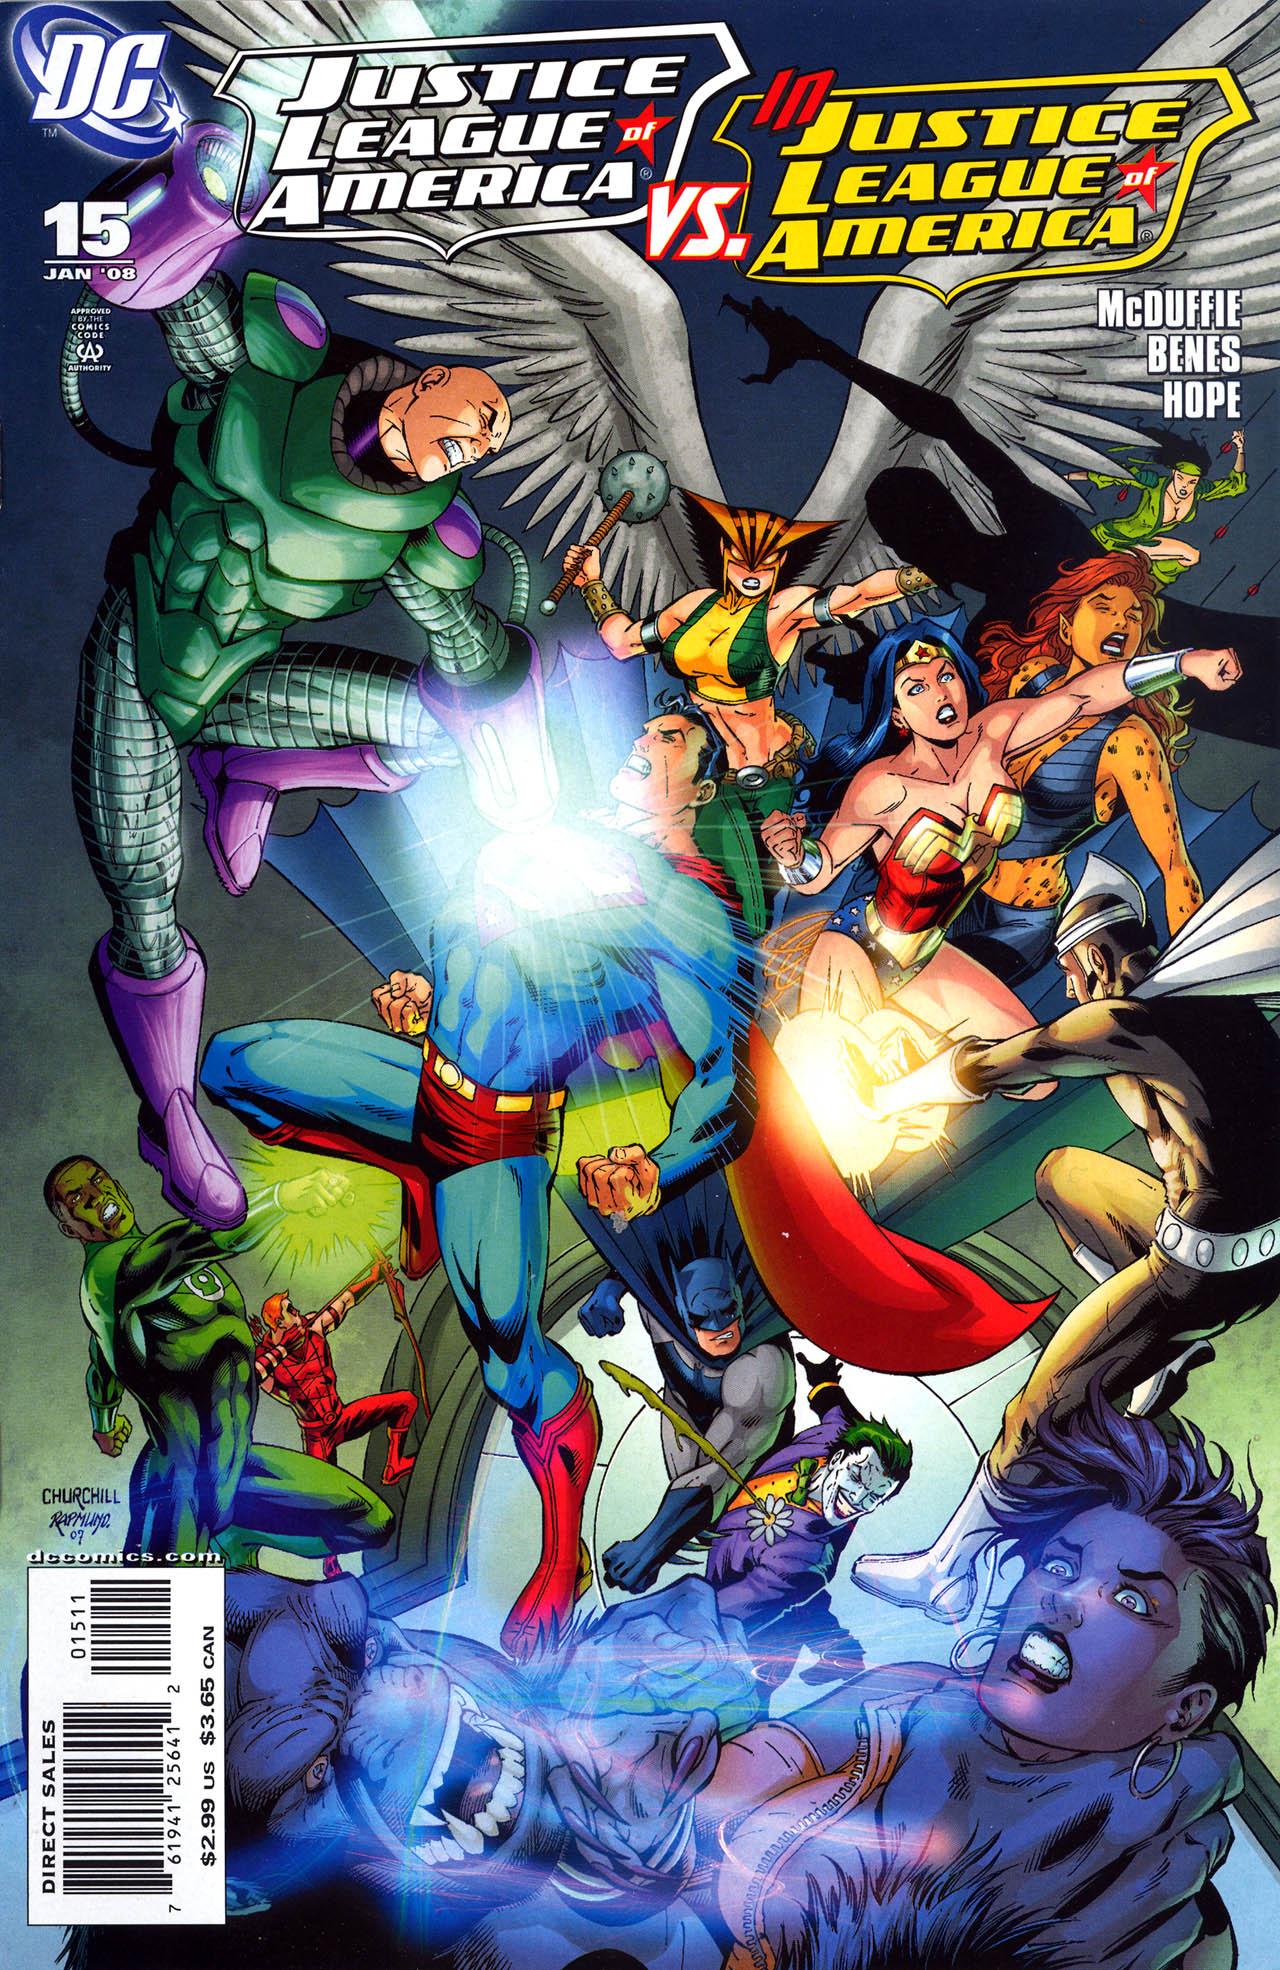 Justice League - Film (2017) - MYmovies.it